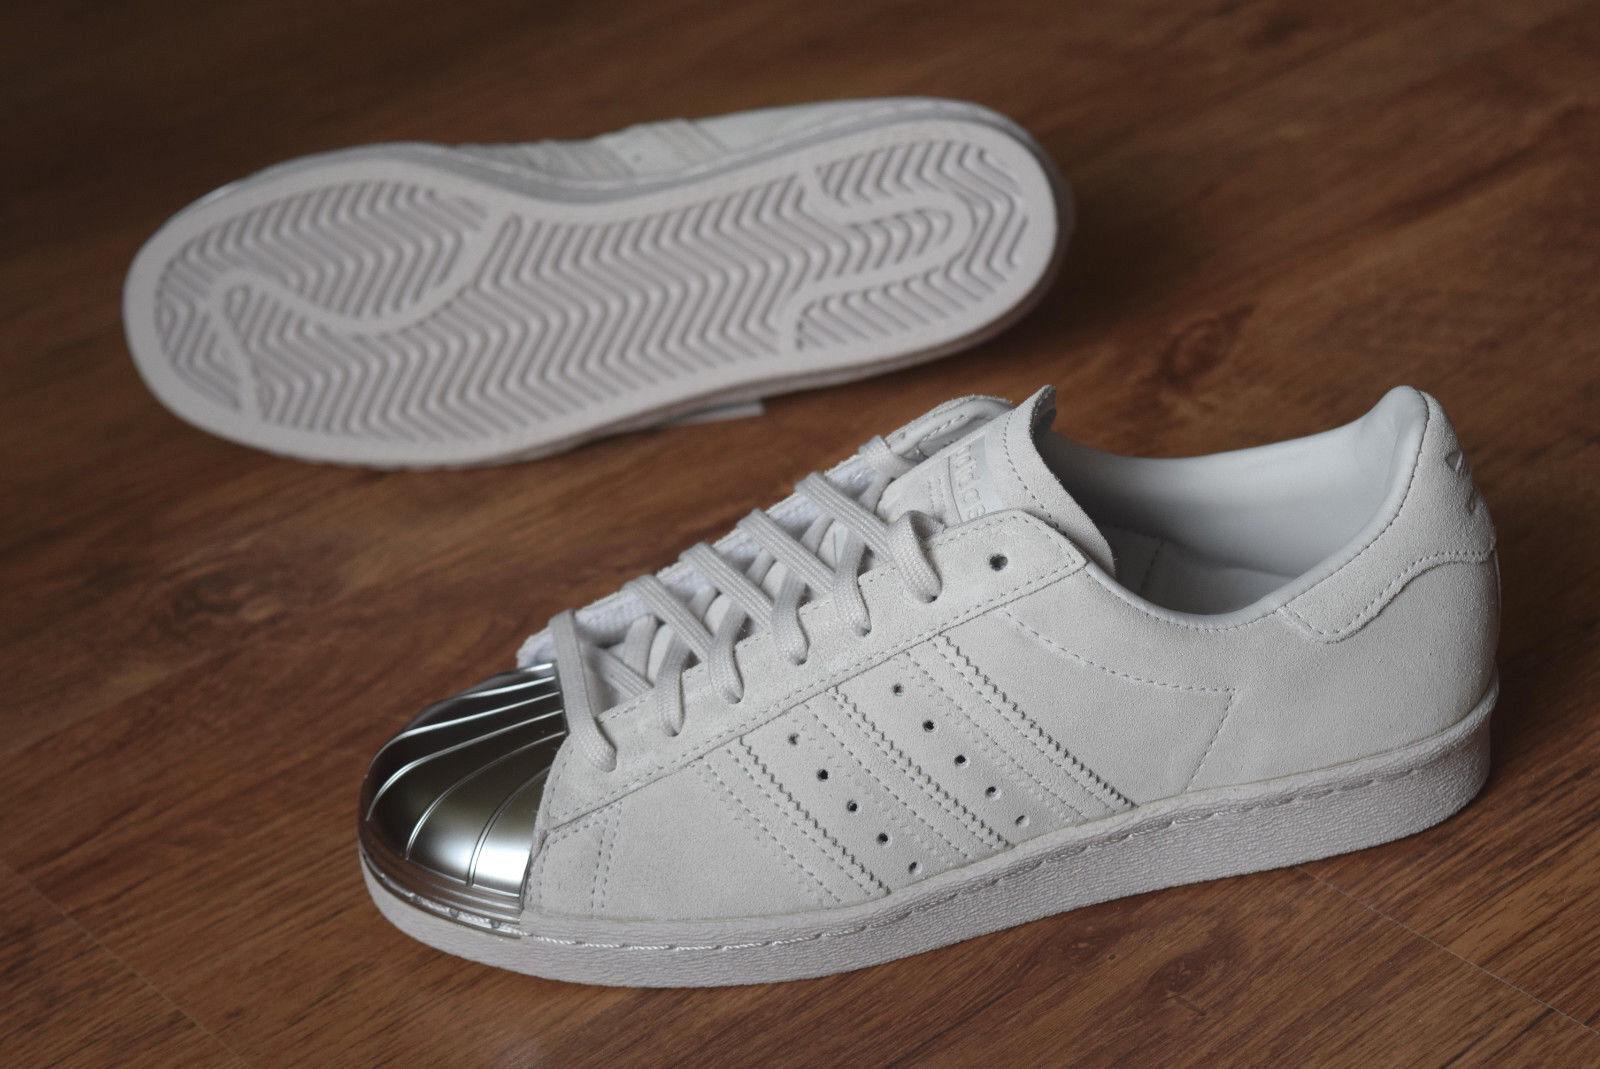 Adidas Superstar Metal Toe W 36 36 36 37 38 39 40 41 CP9945